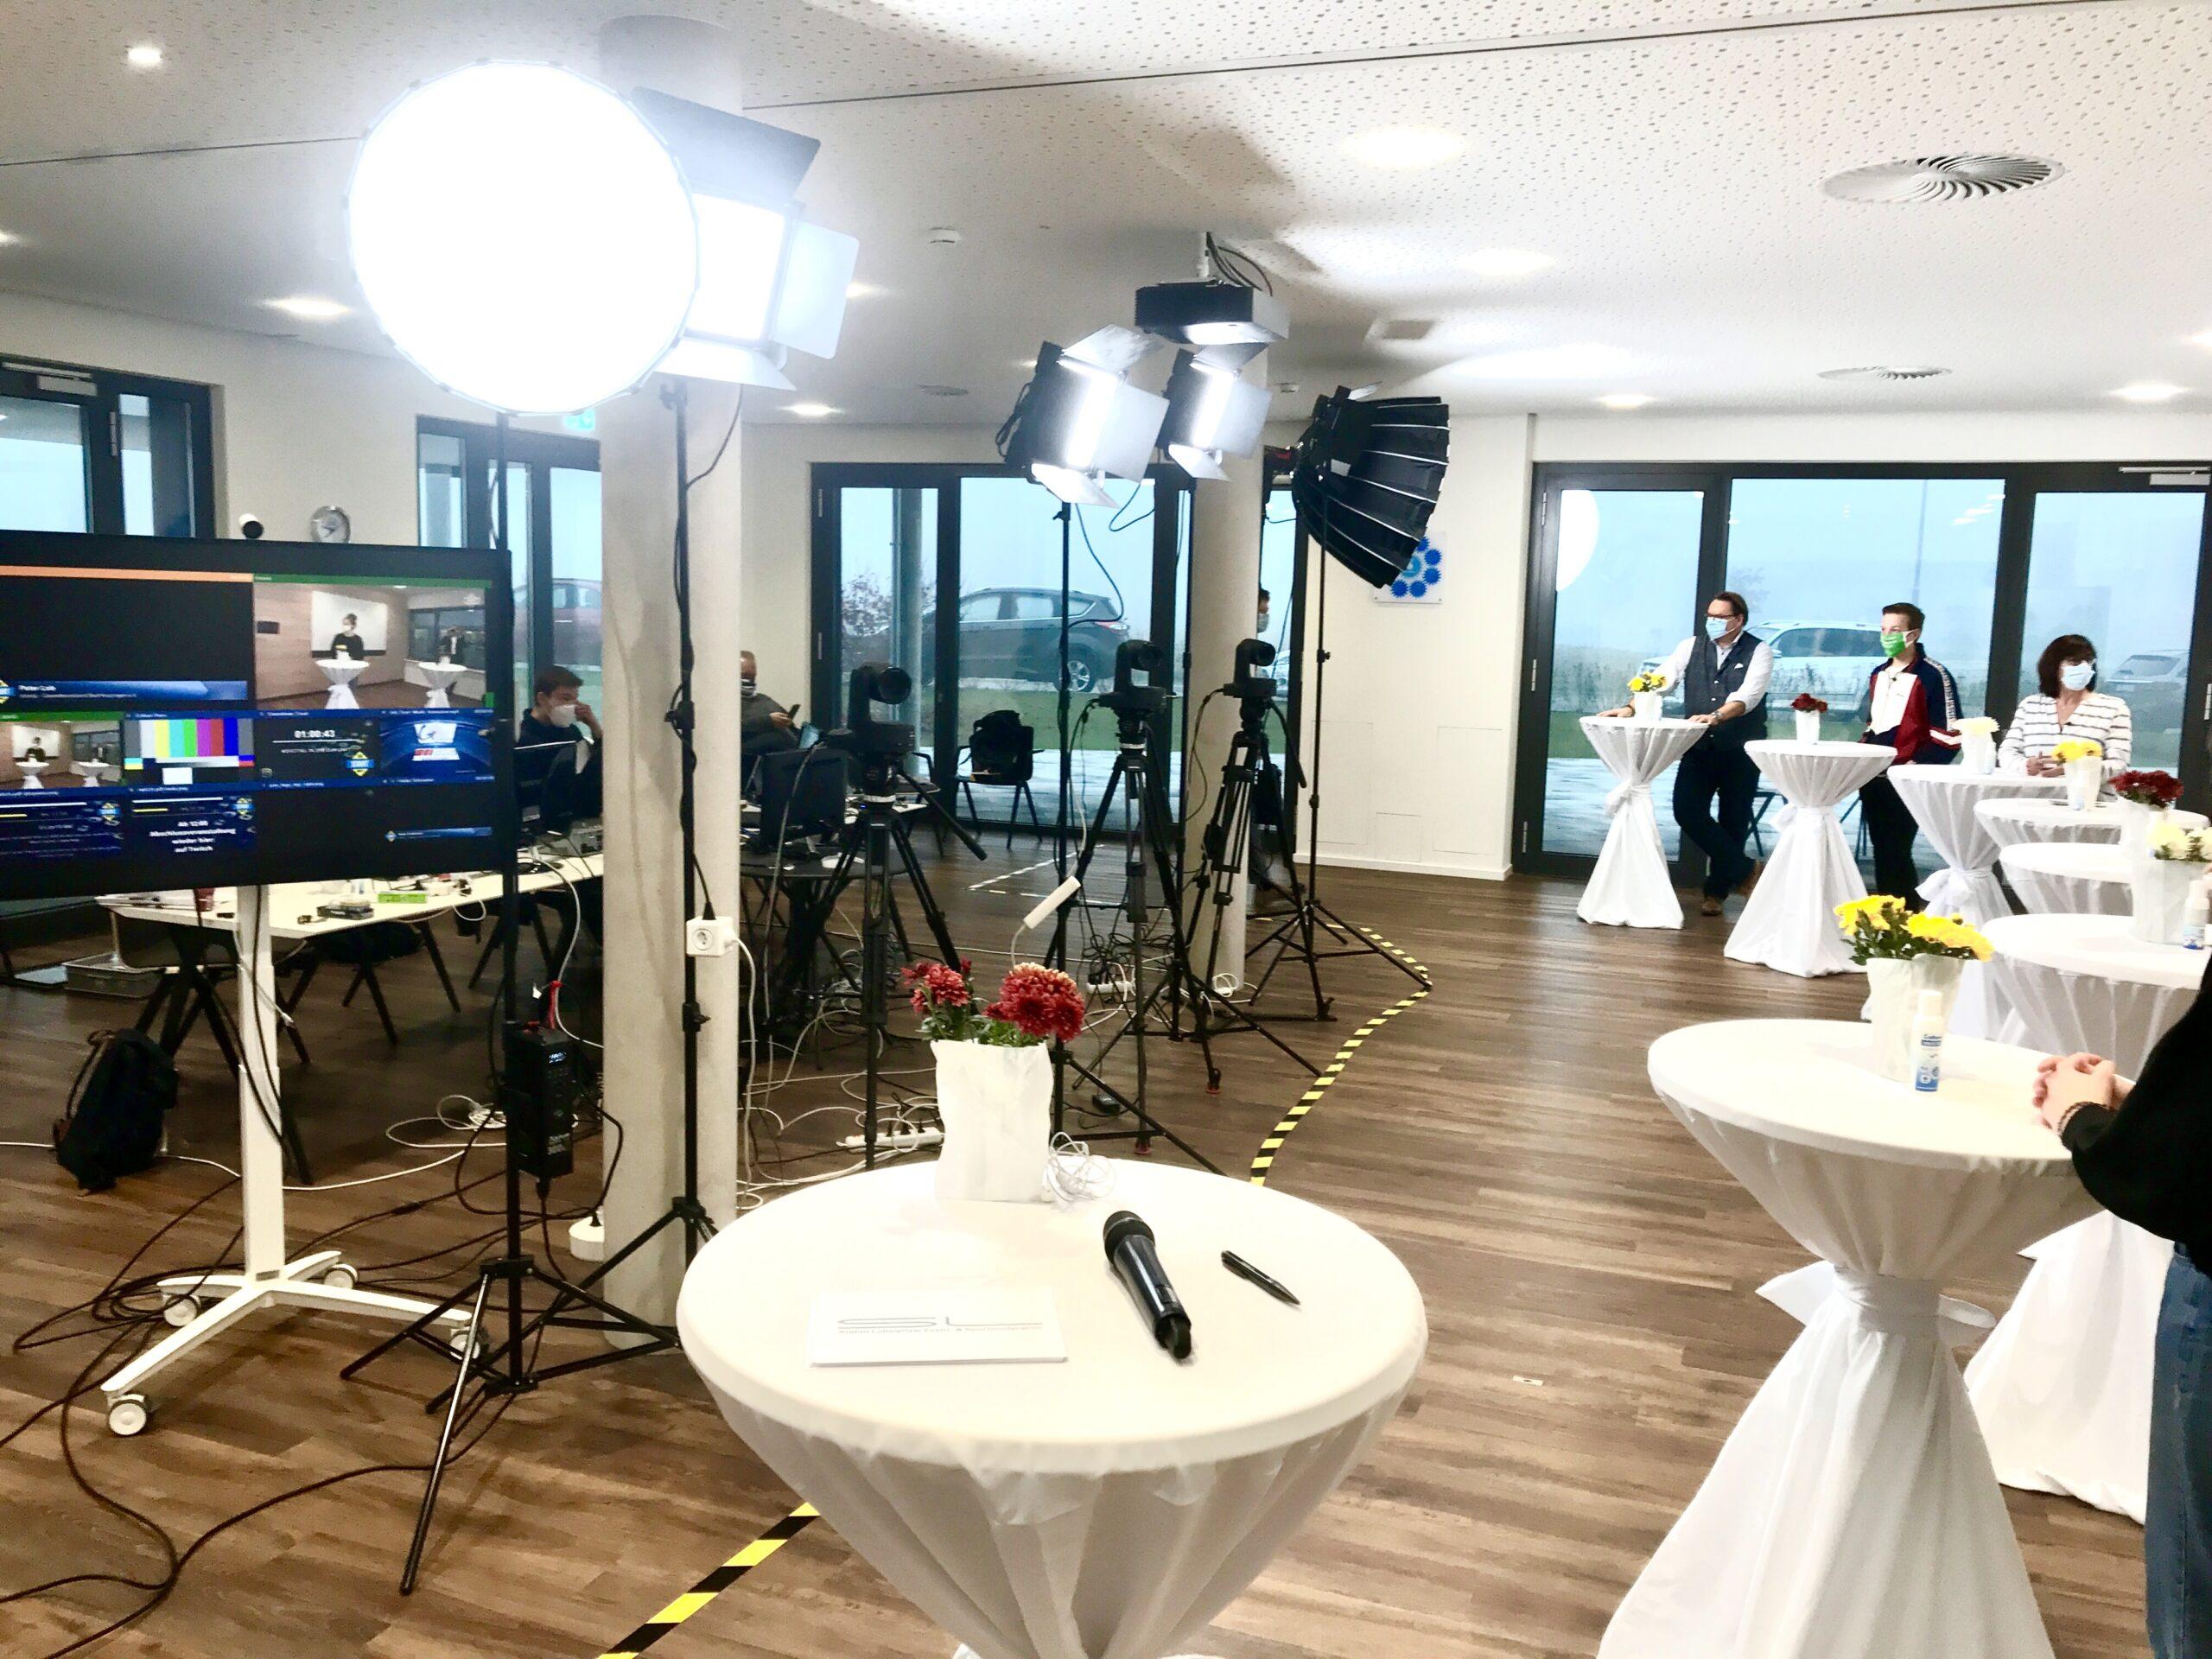 Live Streaming Podiumsdiskussion JobStartMarkt 1